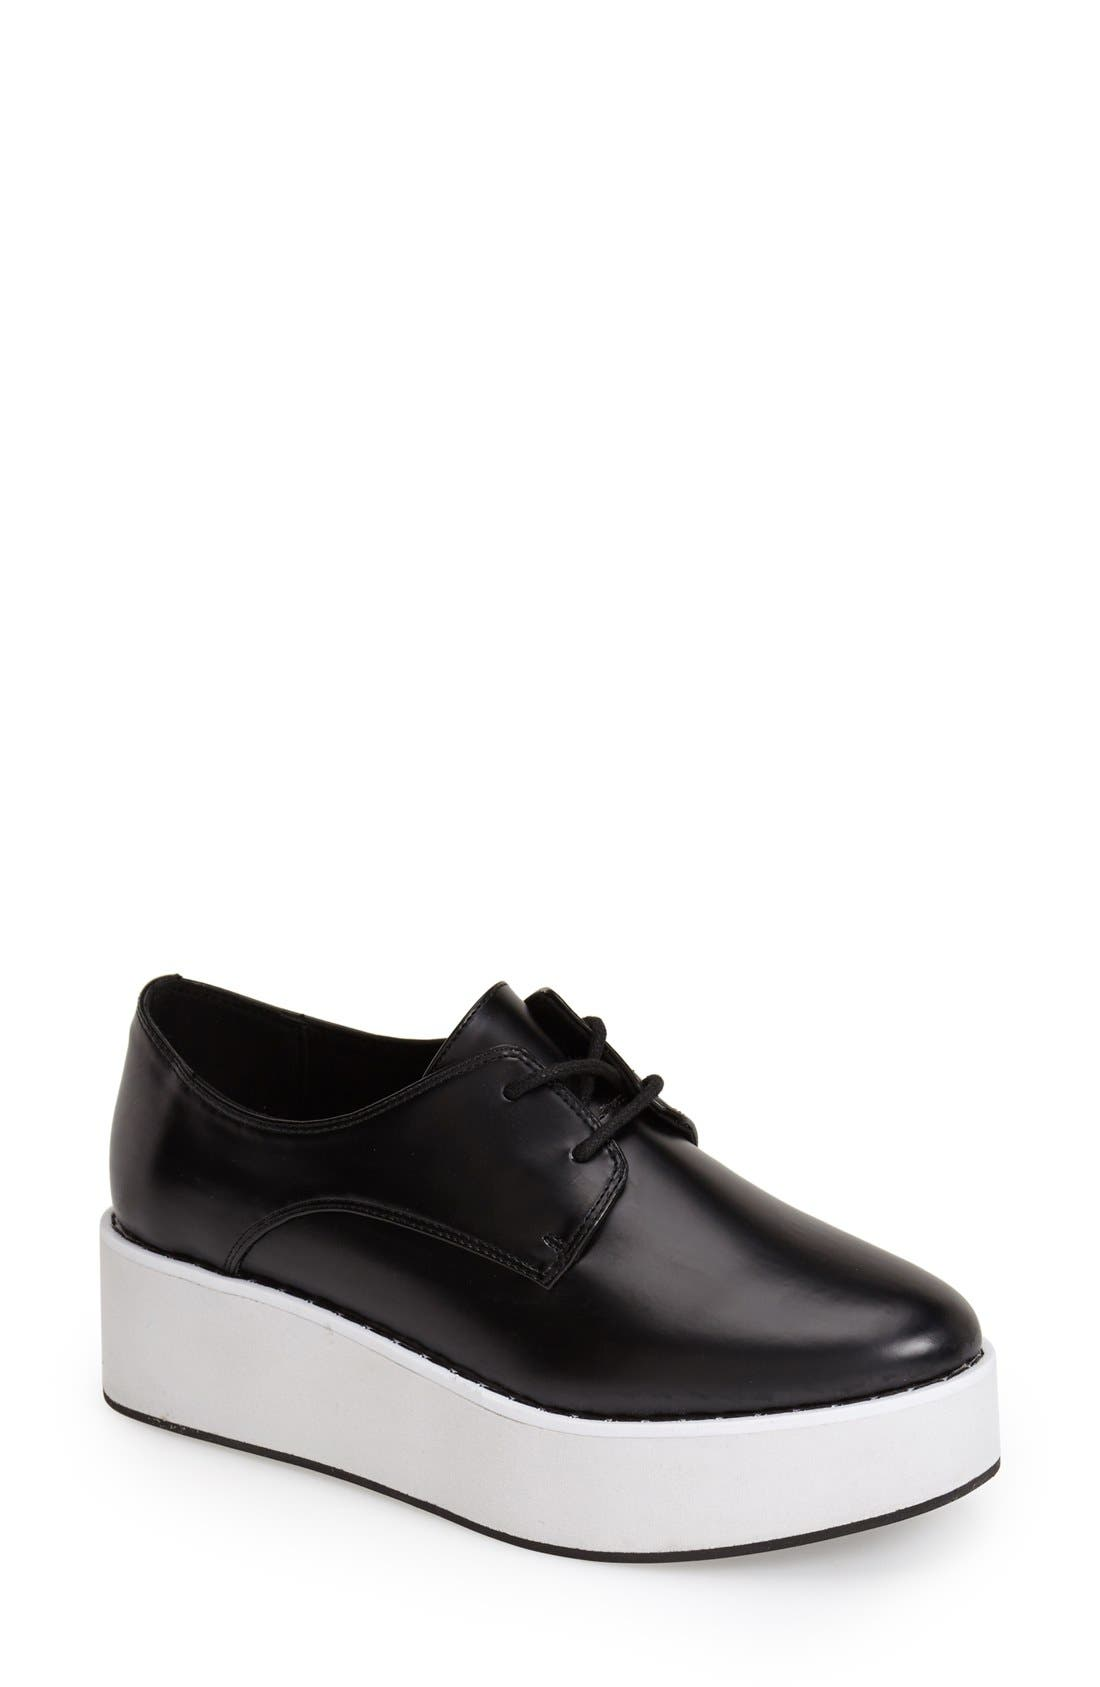 Alternate Image 1 Selected - Topshop 'Kisser Eva' Platform Sneaker (Women)